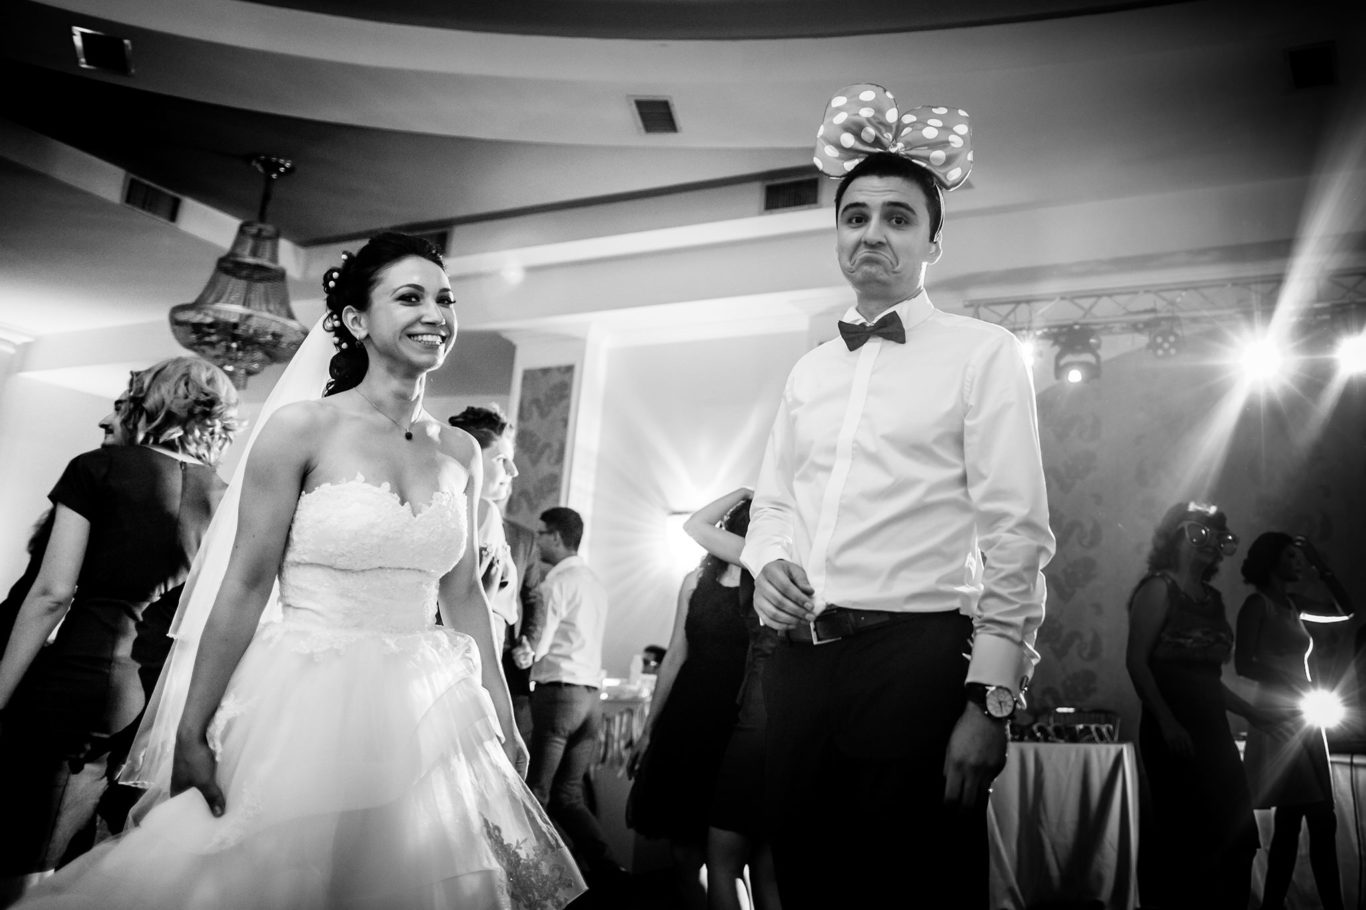 0569-fotografie-nunta-bucuresti-cristina-nicusor-fotograf-ciprian-dumitrescu-dc1_0097-2